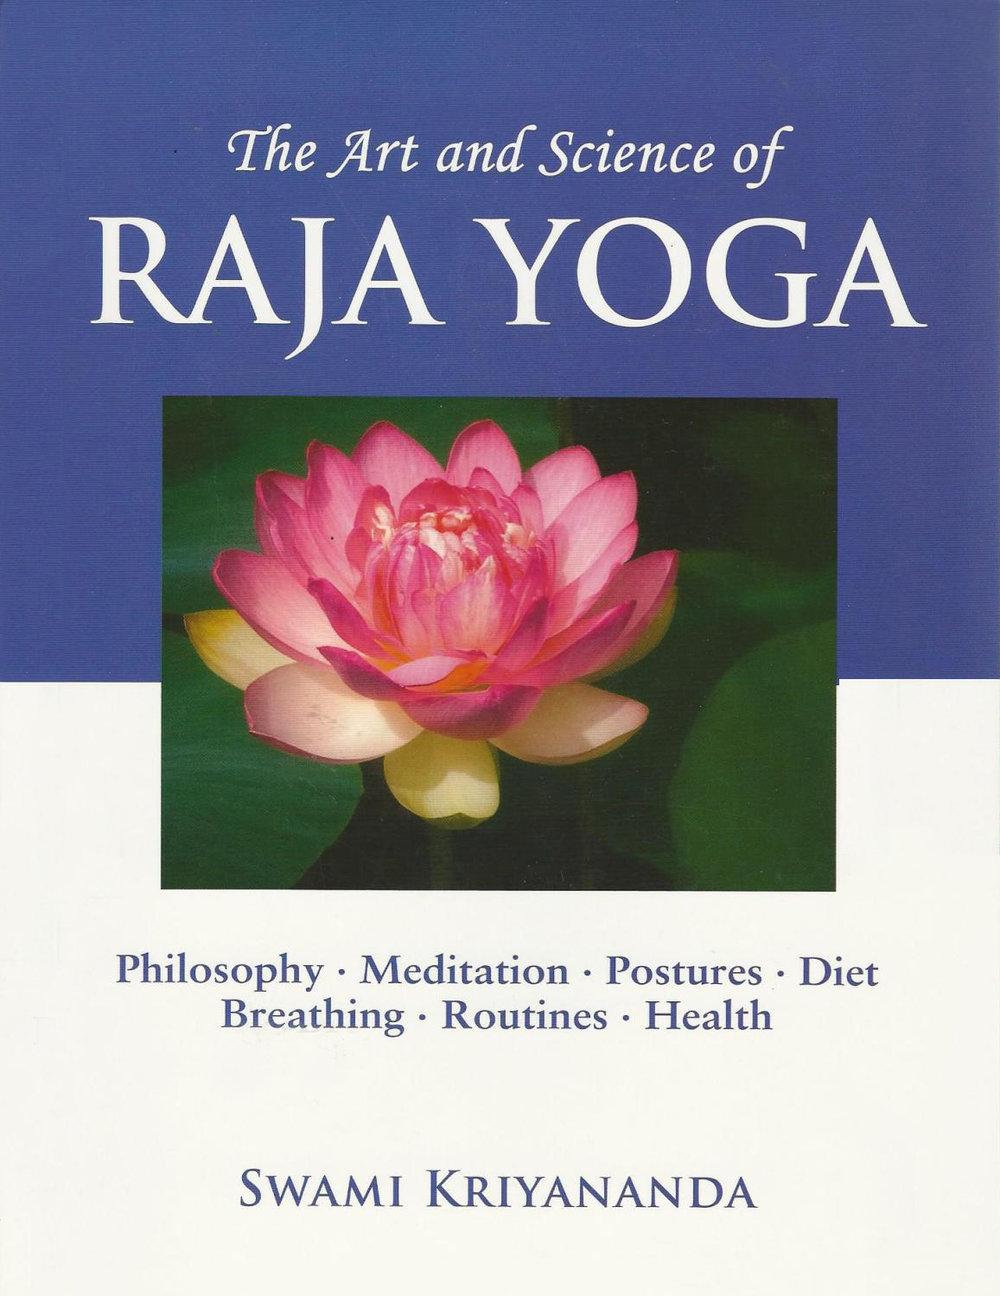 Raja Yoga cover large.jpg